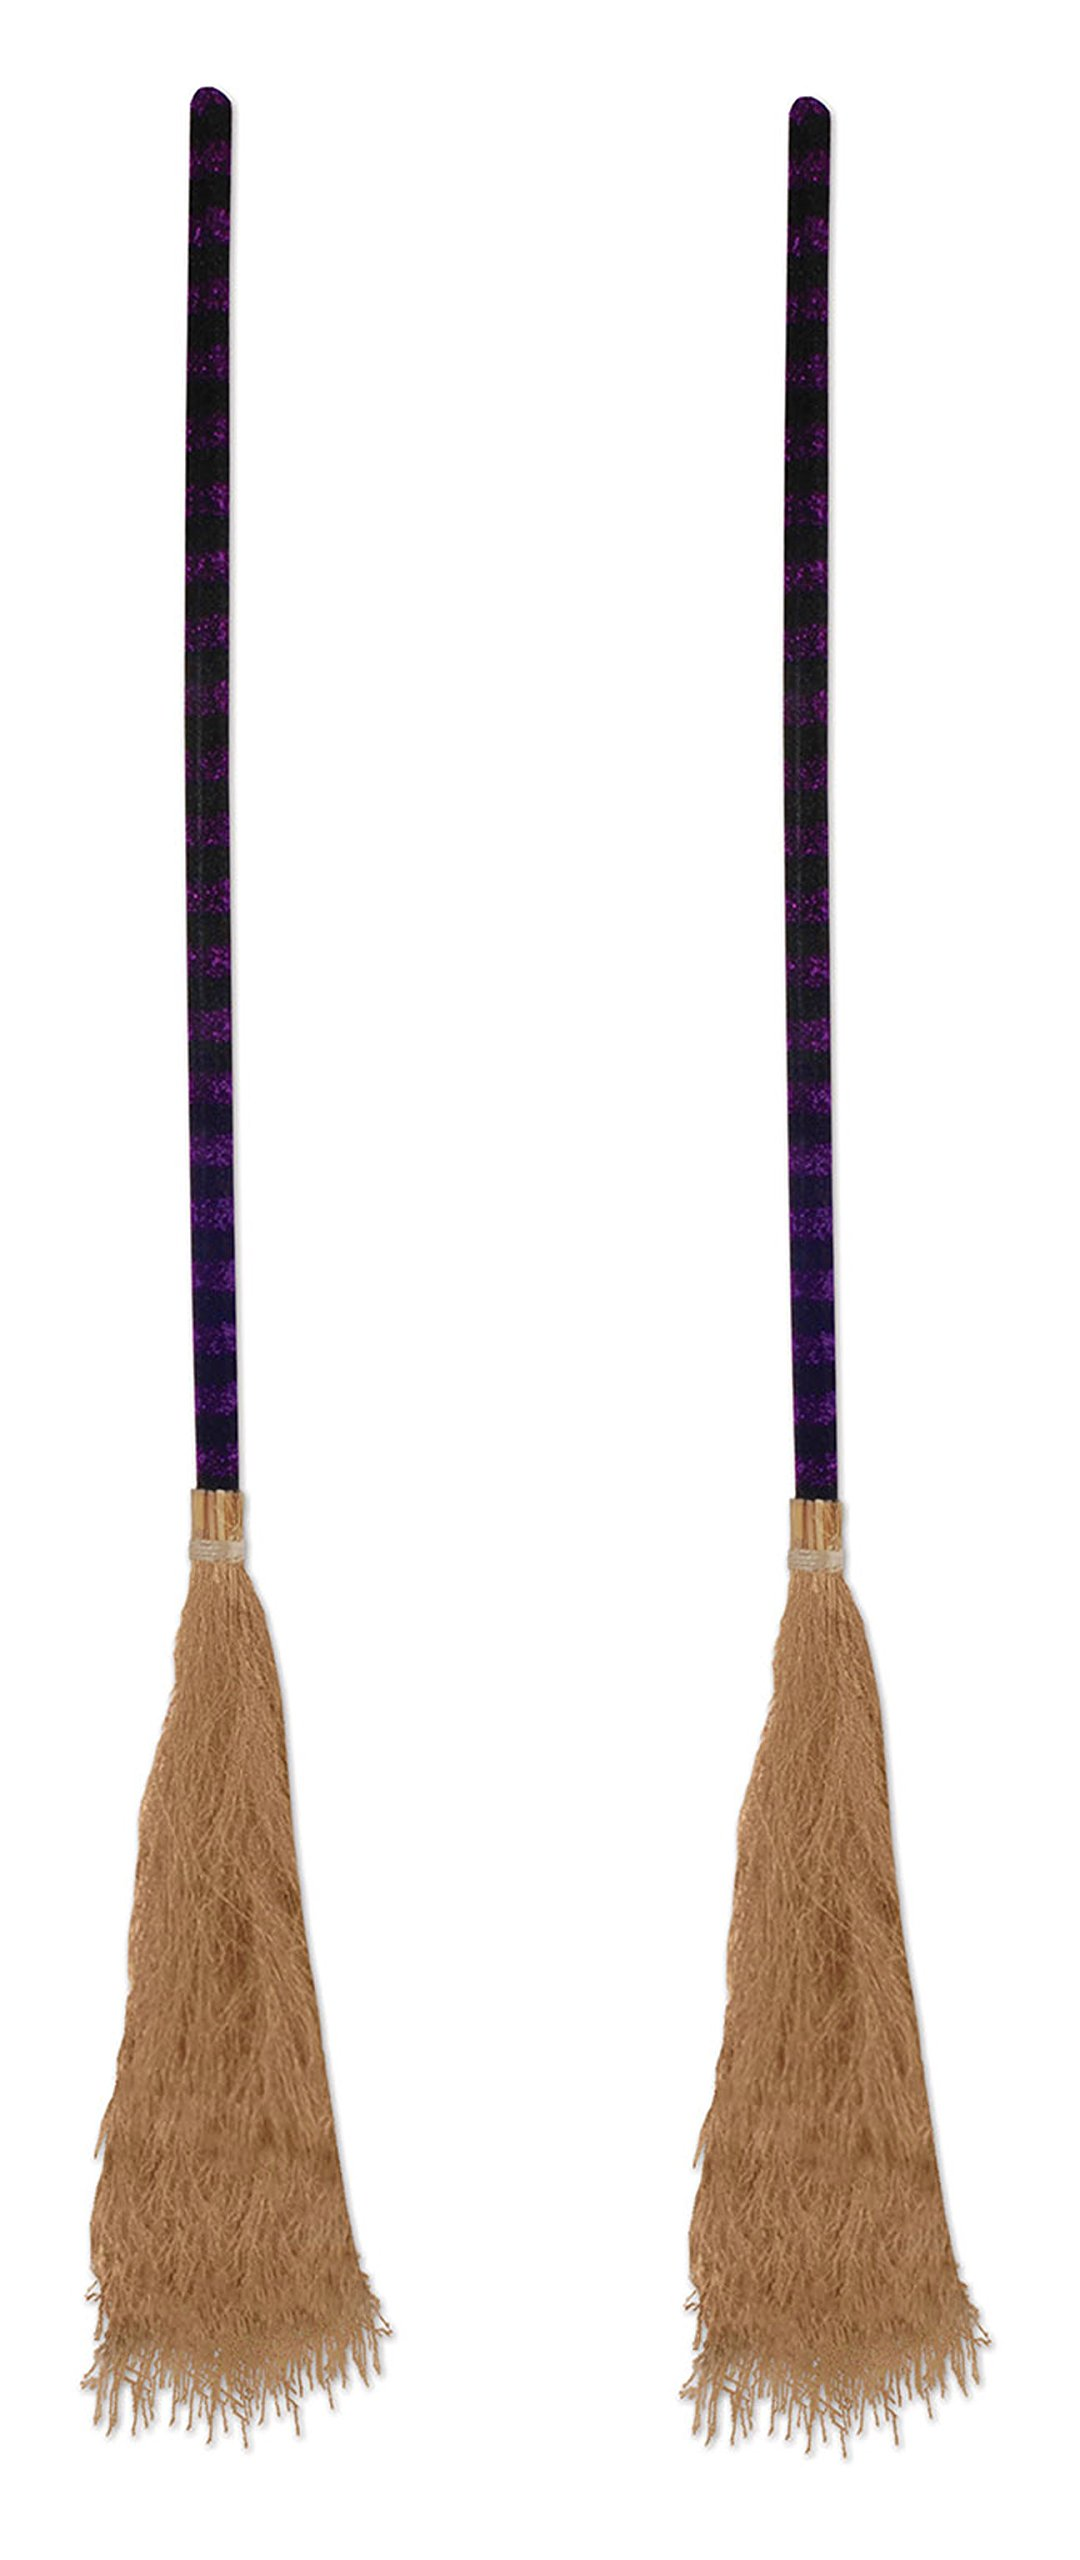 Beistle S00827AZ2 Witch's Brooms 2 Piece, Black/Purple/Tan by Beistle